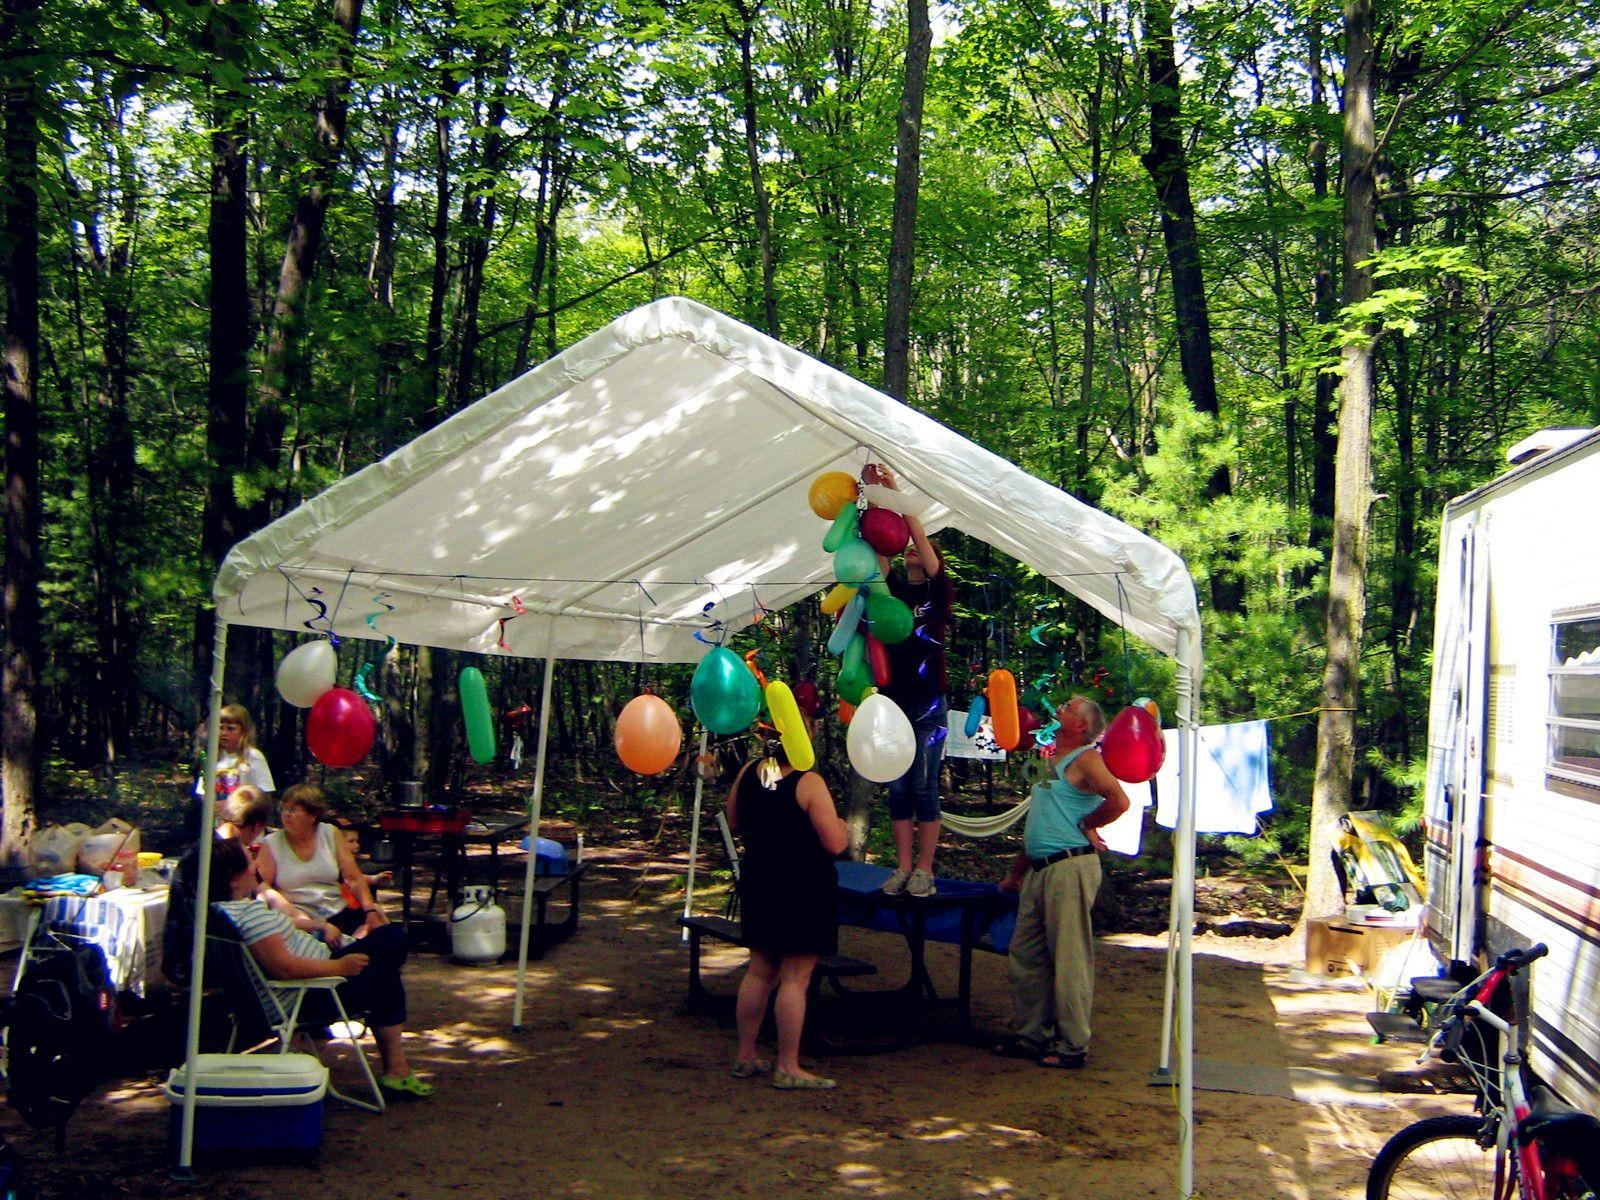 10' x 20' White Party Tent Party tent, Party tents for